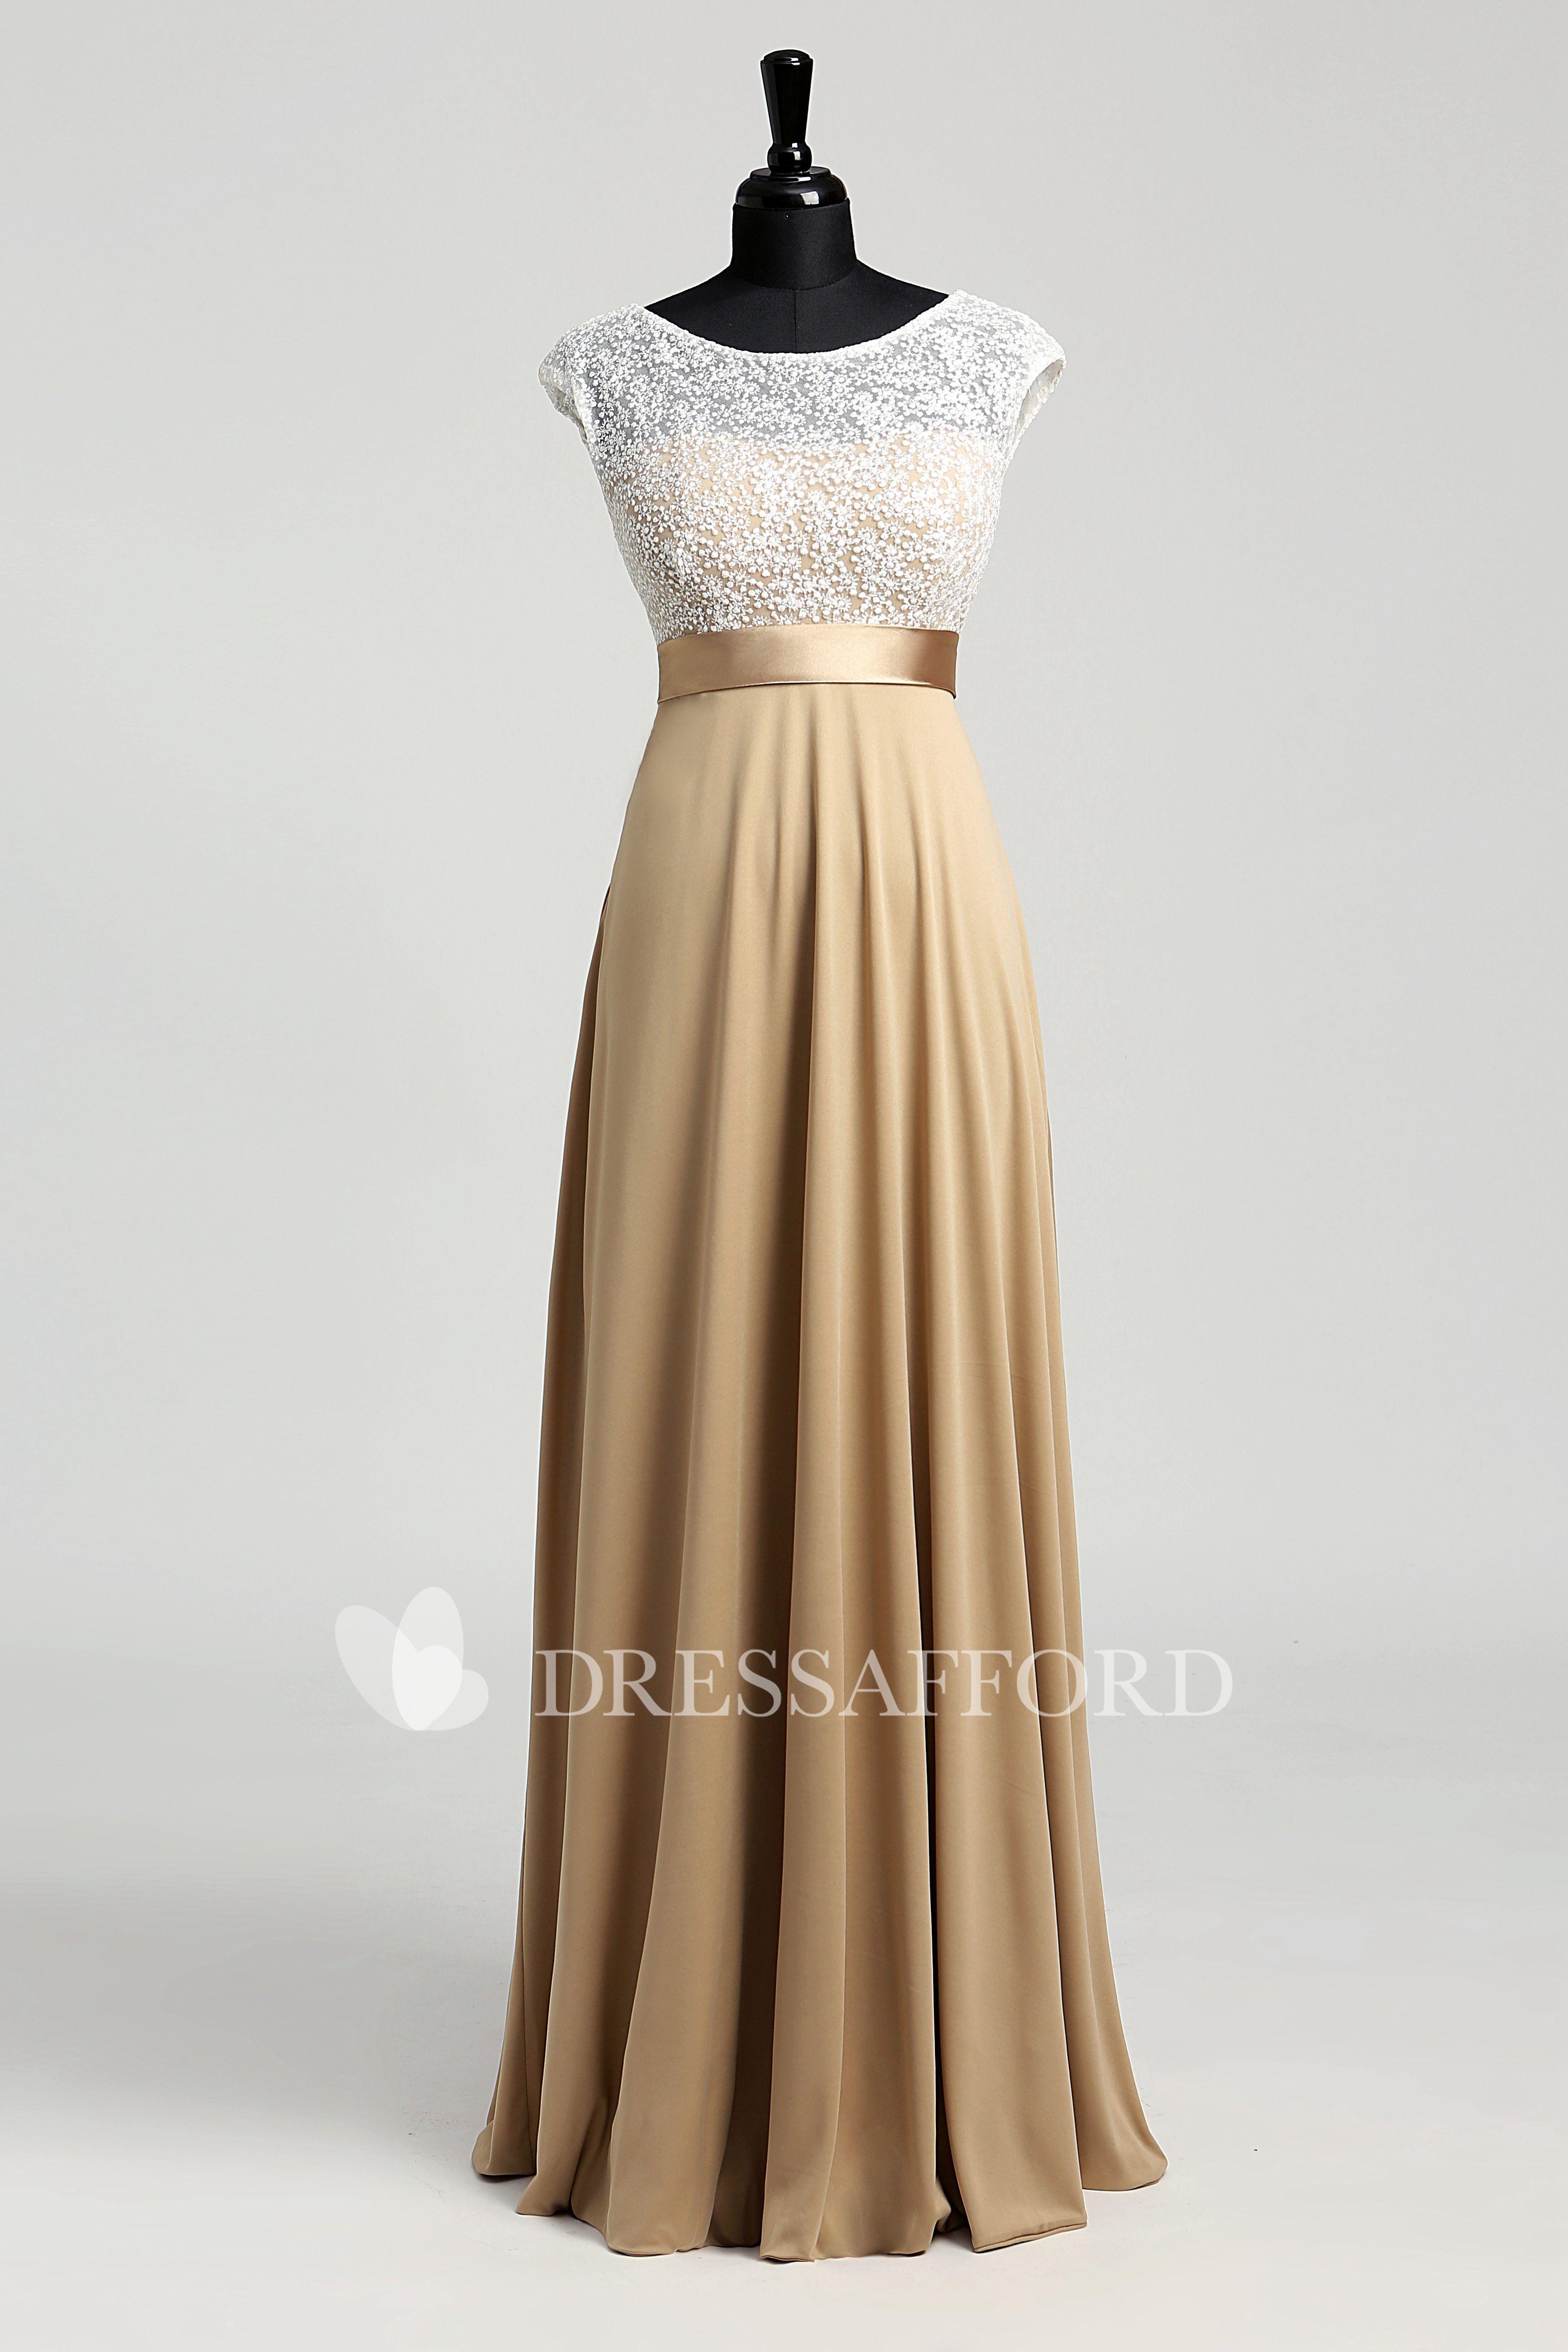 74bc19c78c9 A-line Jersey Lace Bateau Floor-length Short Sleeve Lace Dress with  Sash Ribbon